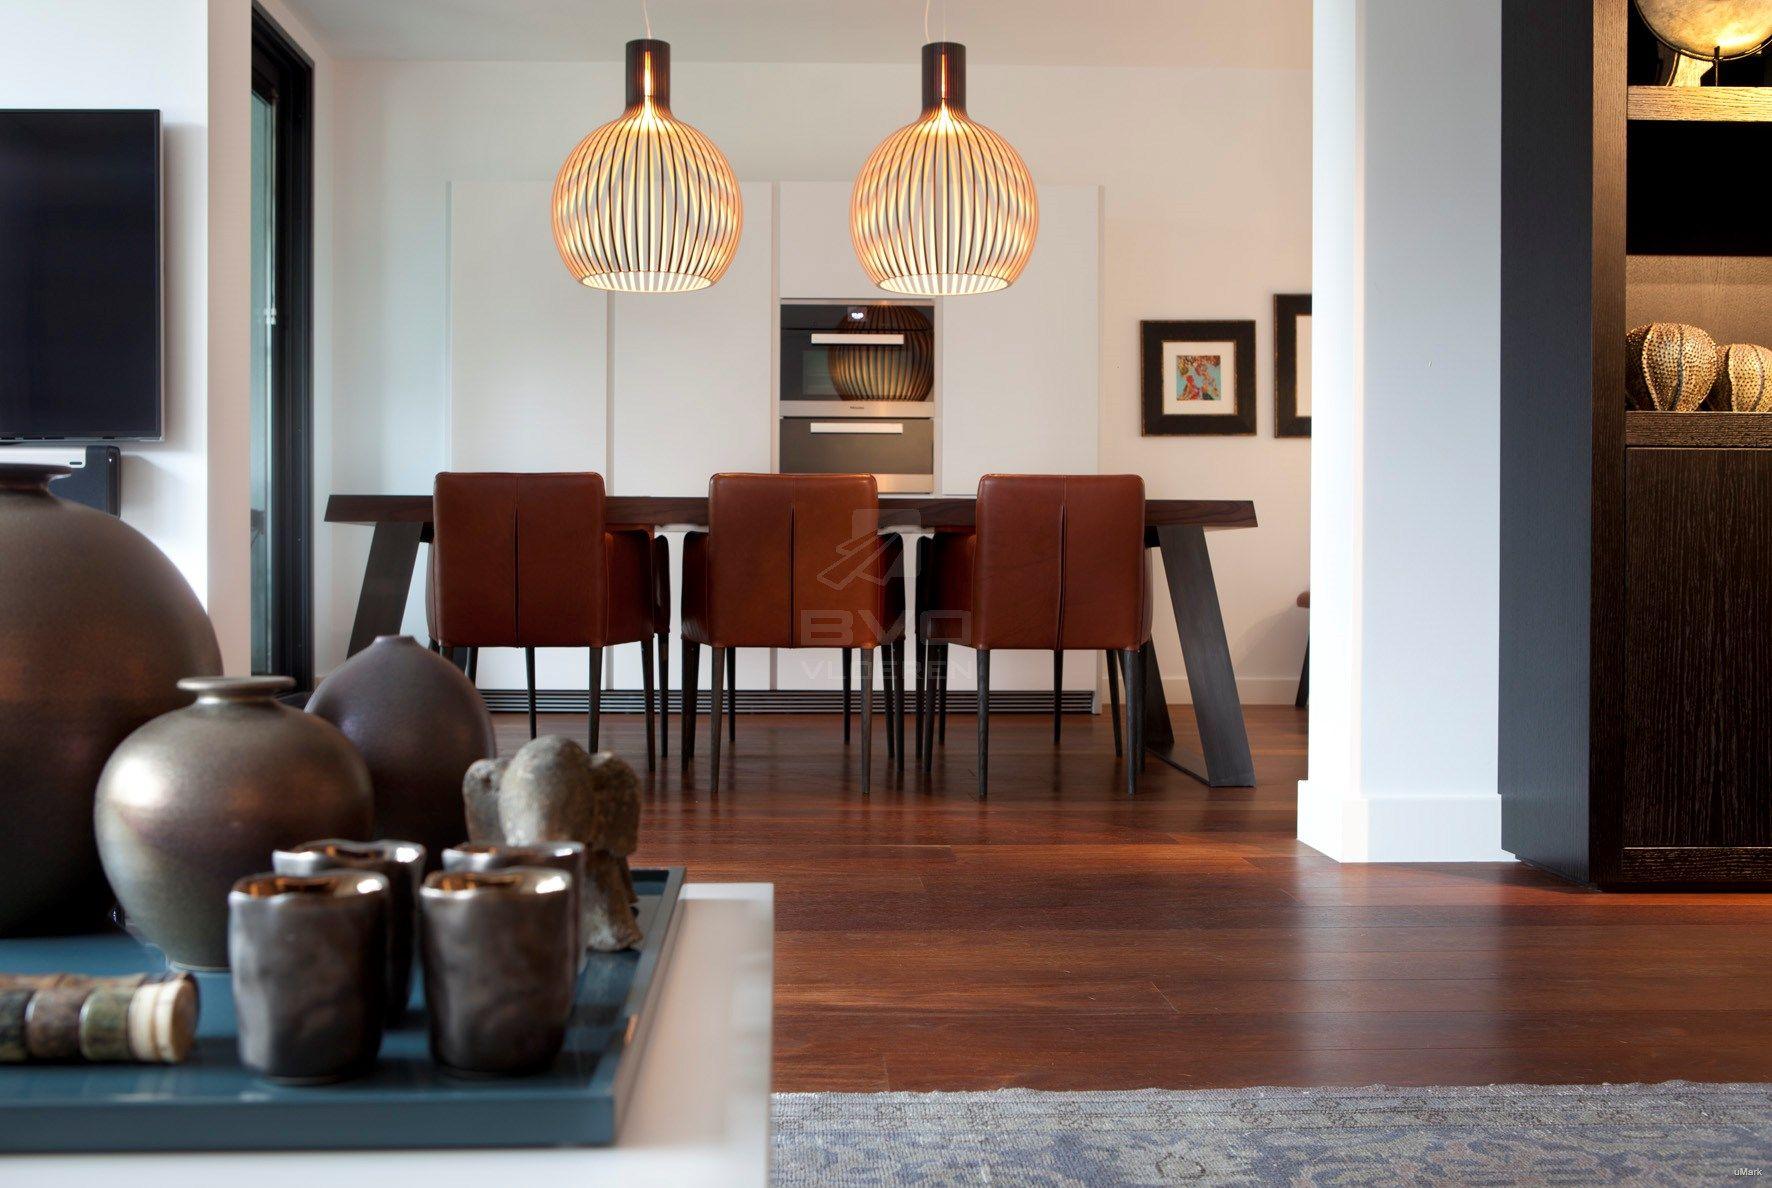 Houten Vloeren Breda : Houten vloer in eetkamer zwarte kabbes of sucupira meubilair